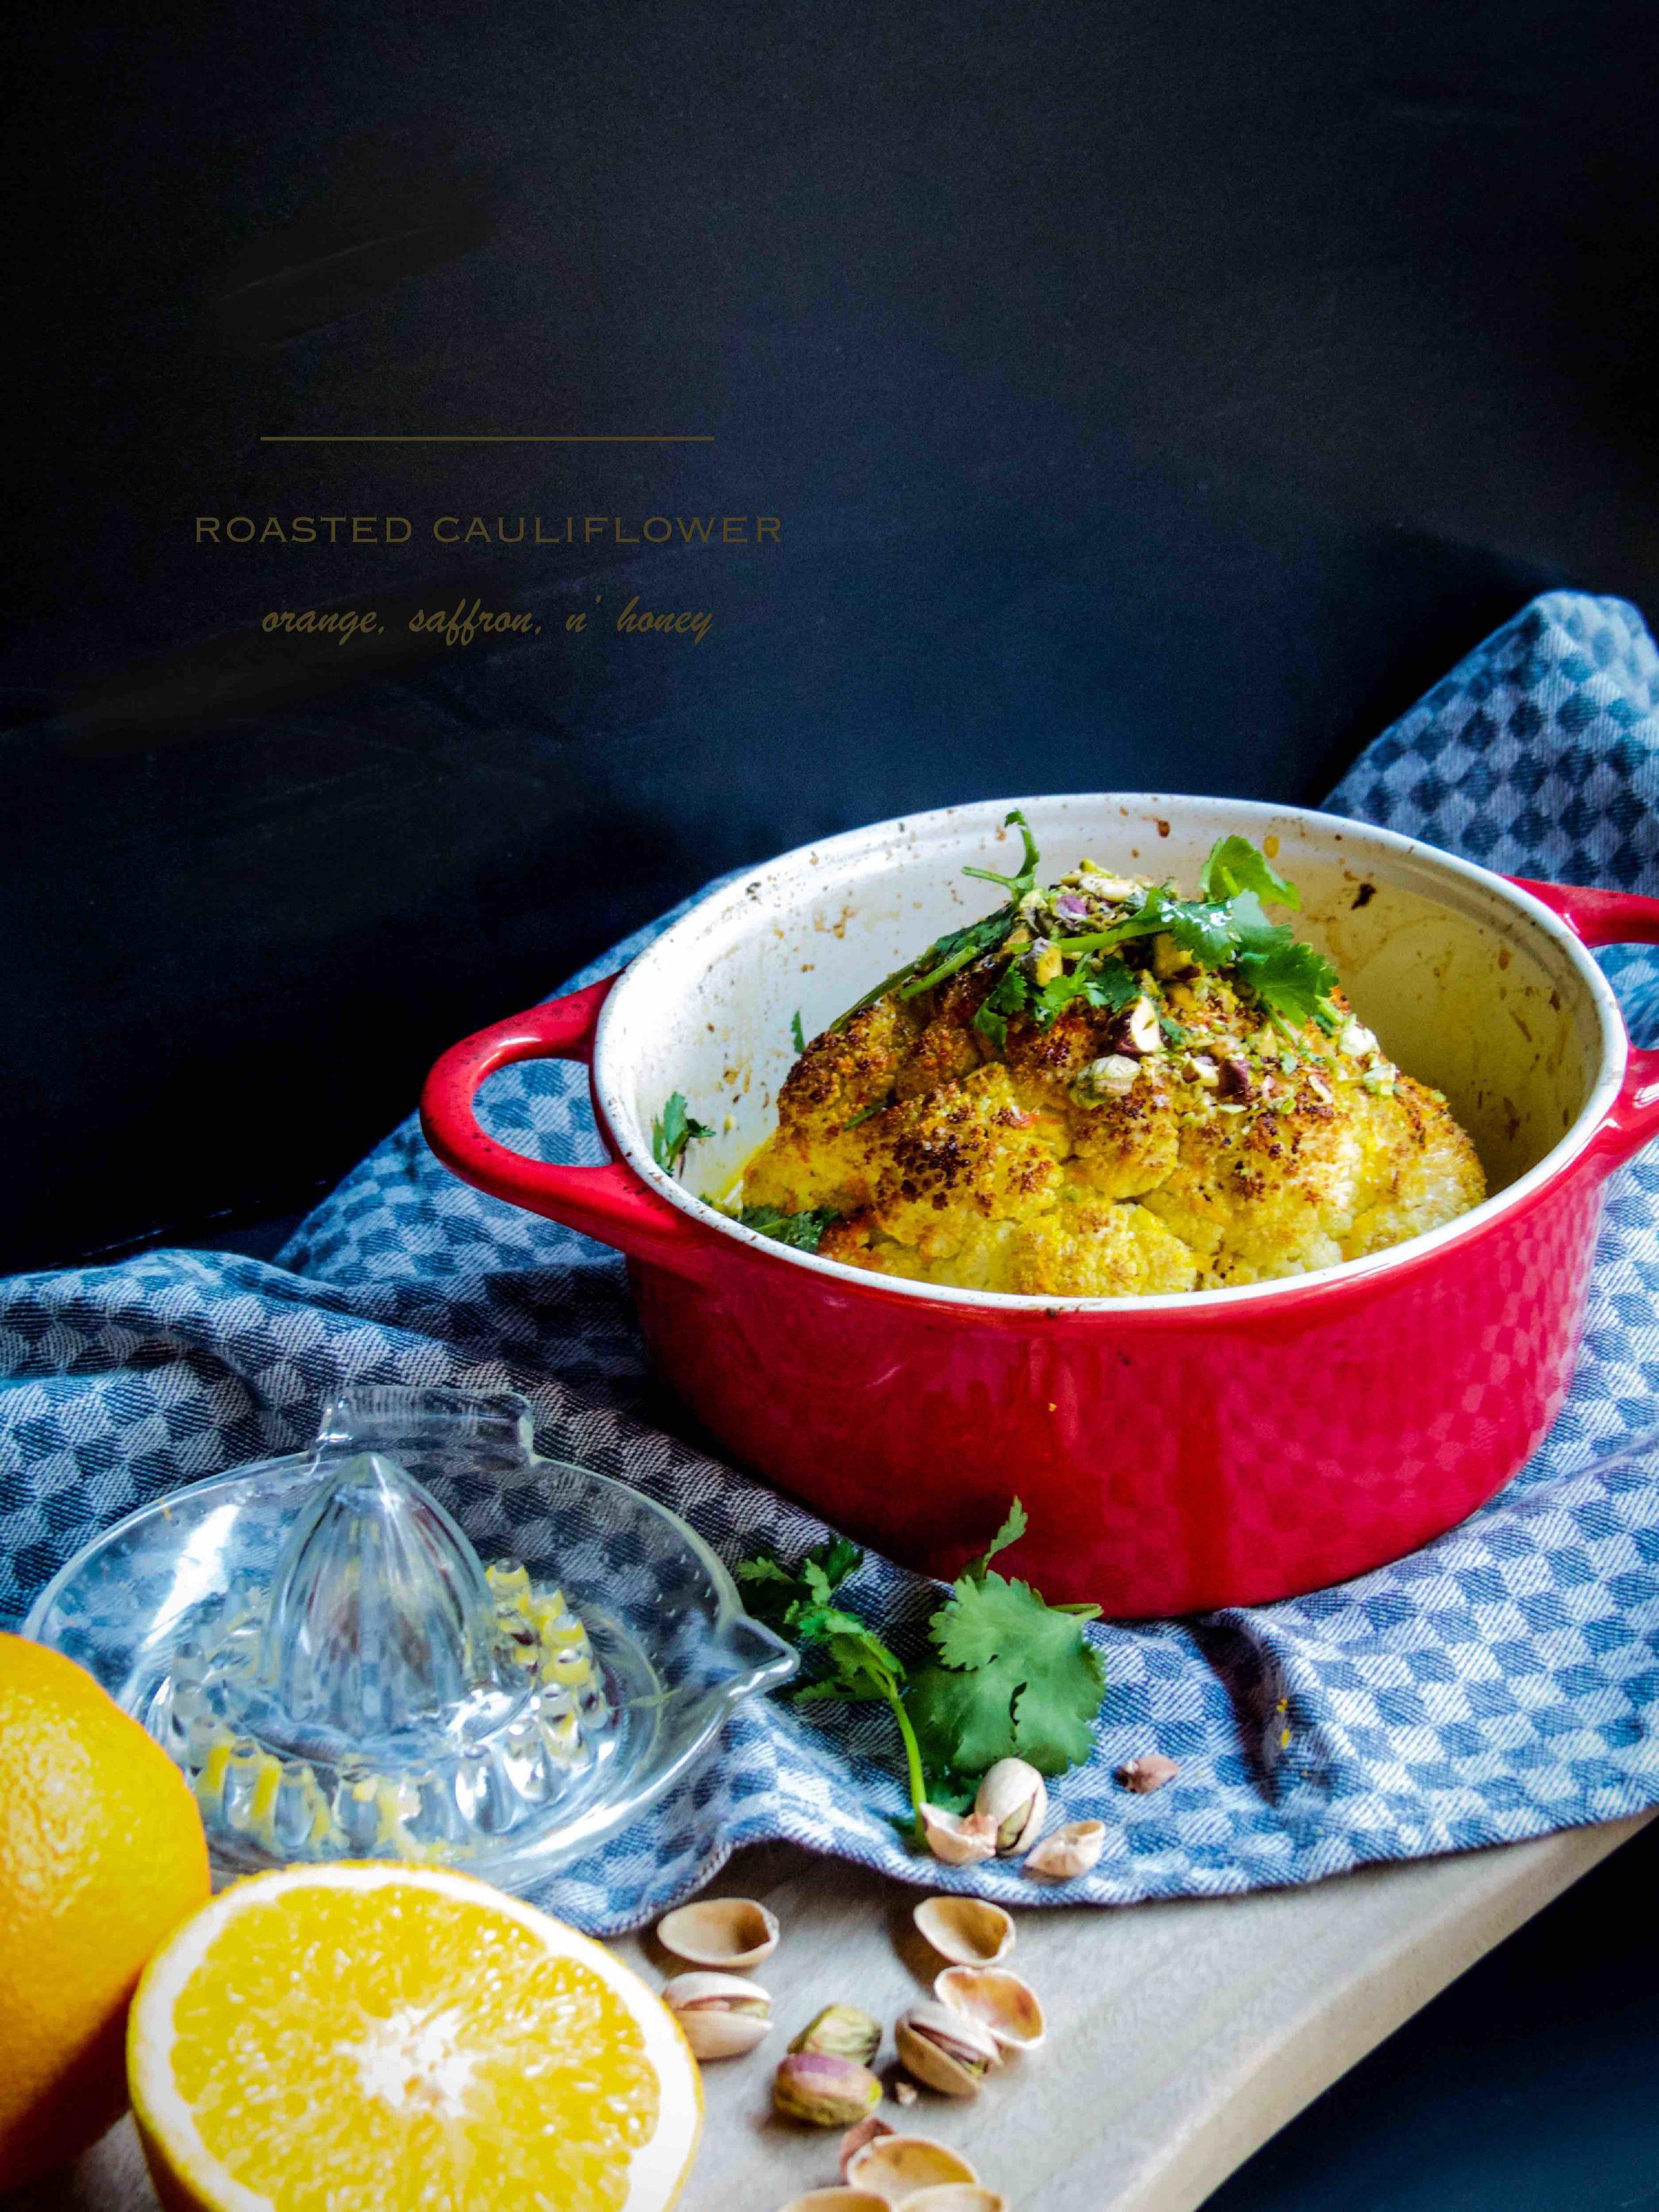 Roasted Cauliflower with Orange, Saffron, Honey and Pistachio